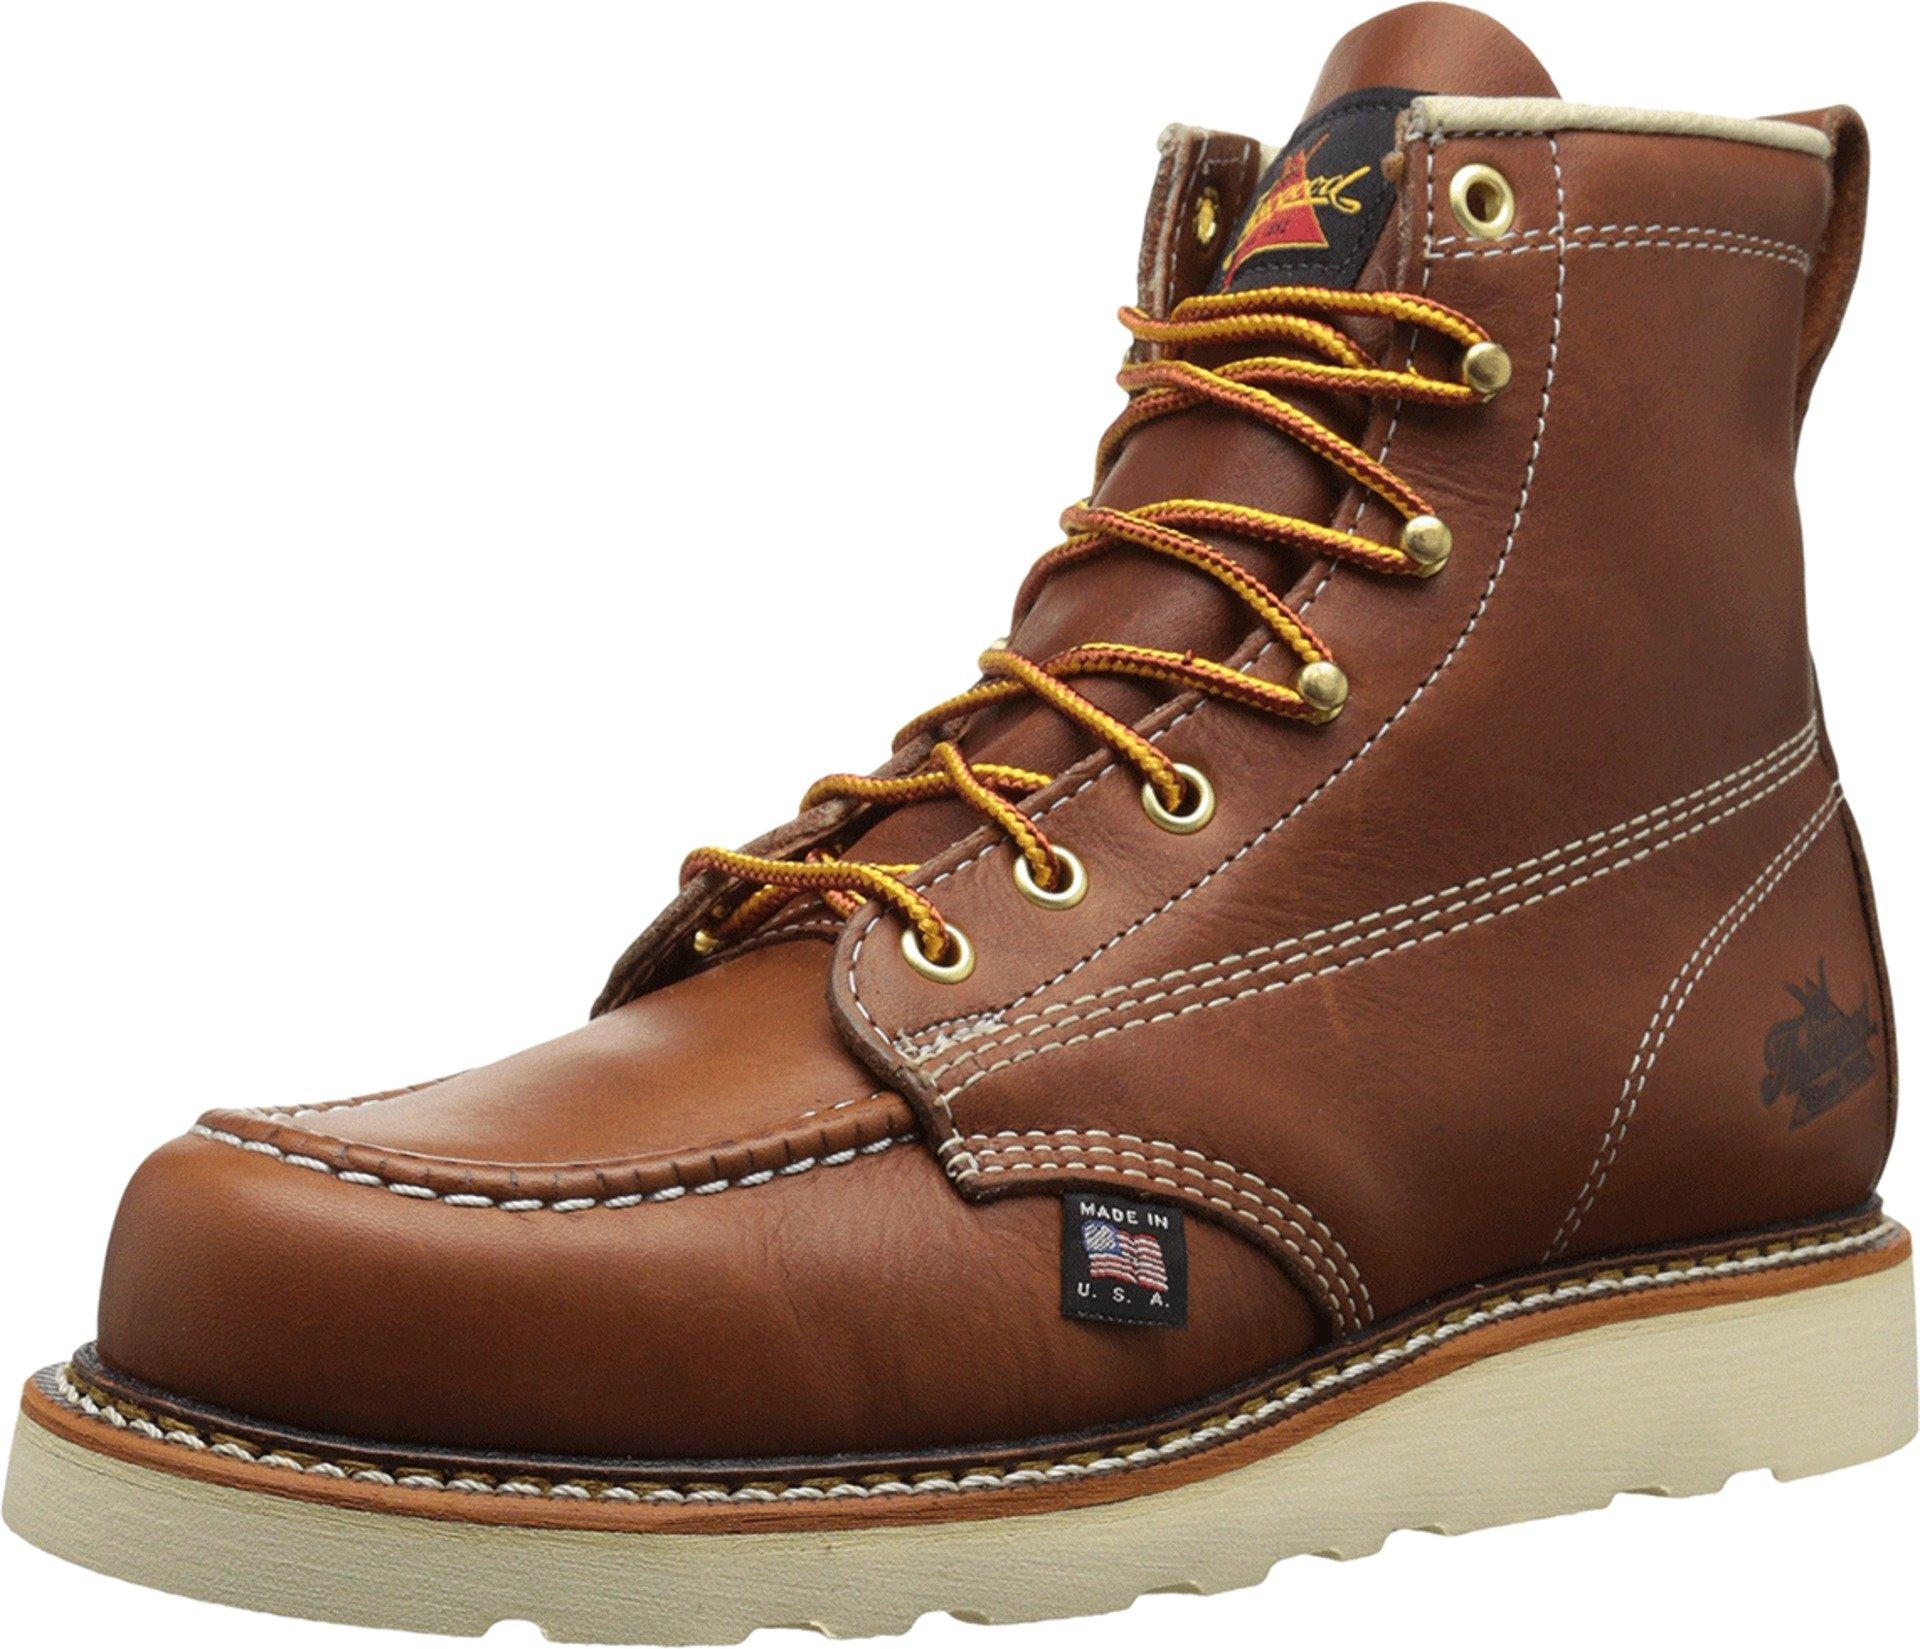 Thorogood 814-4200 American Heritage 6'' Moc Toe Boot, Tobacco, 11 D US